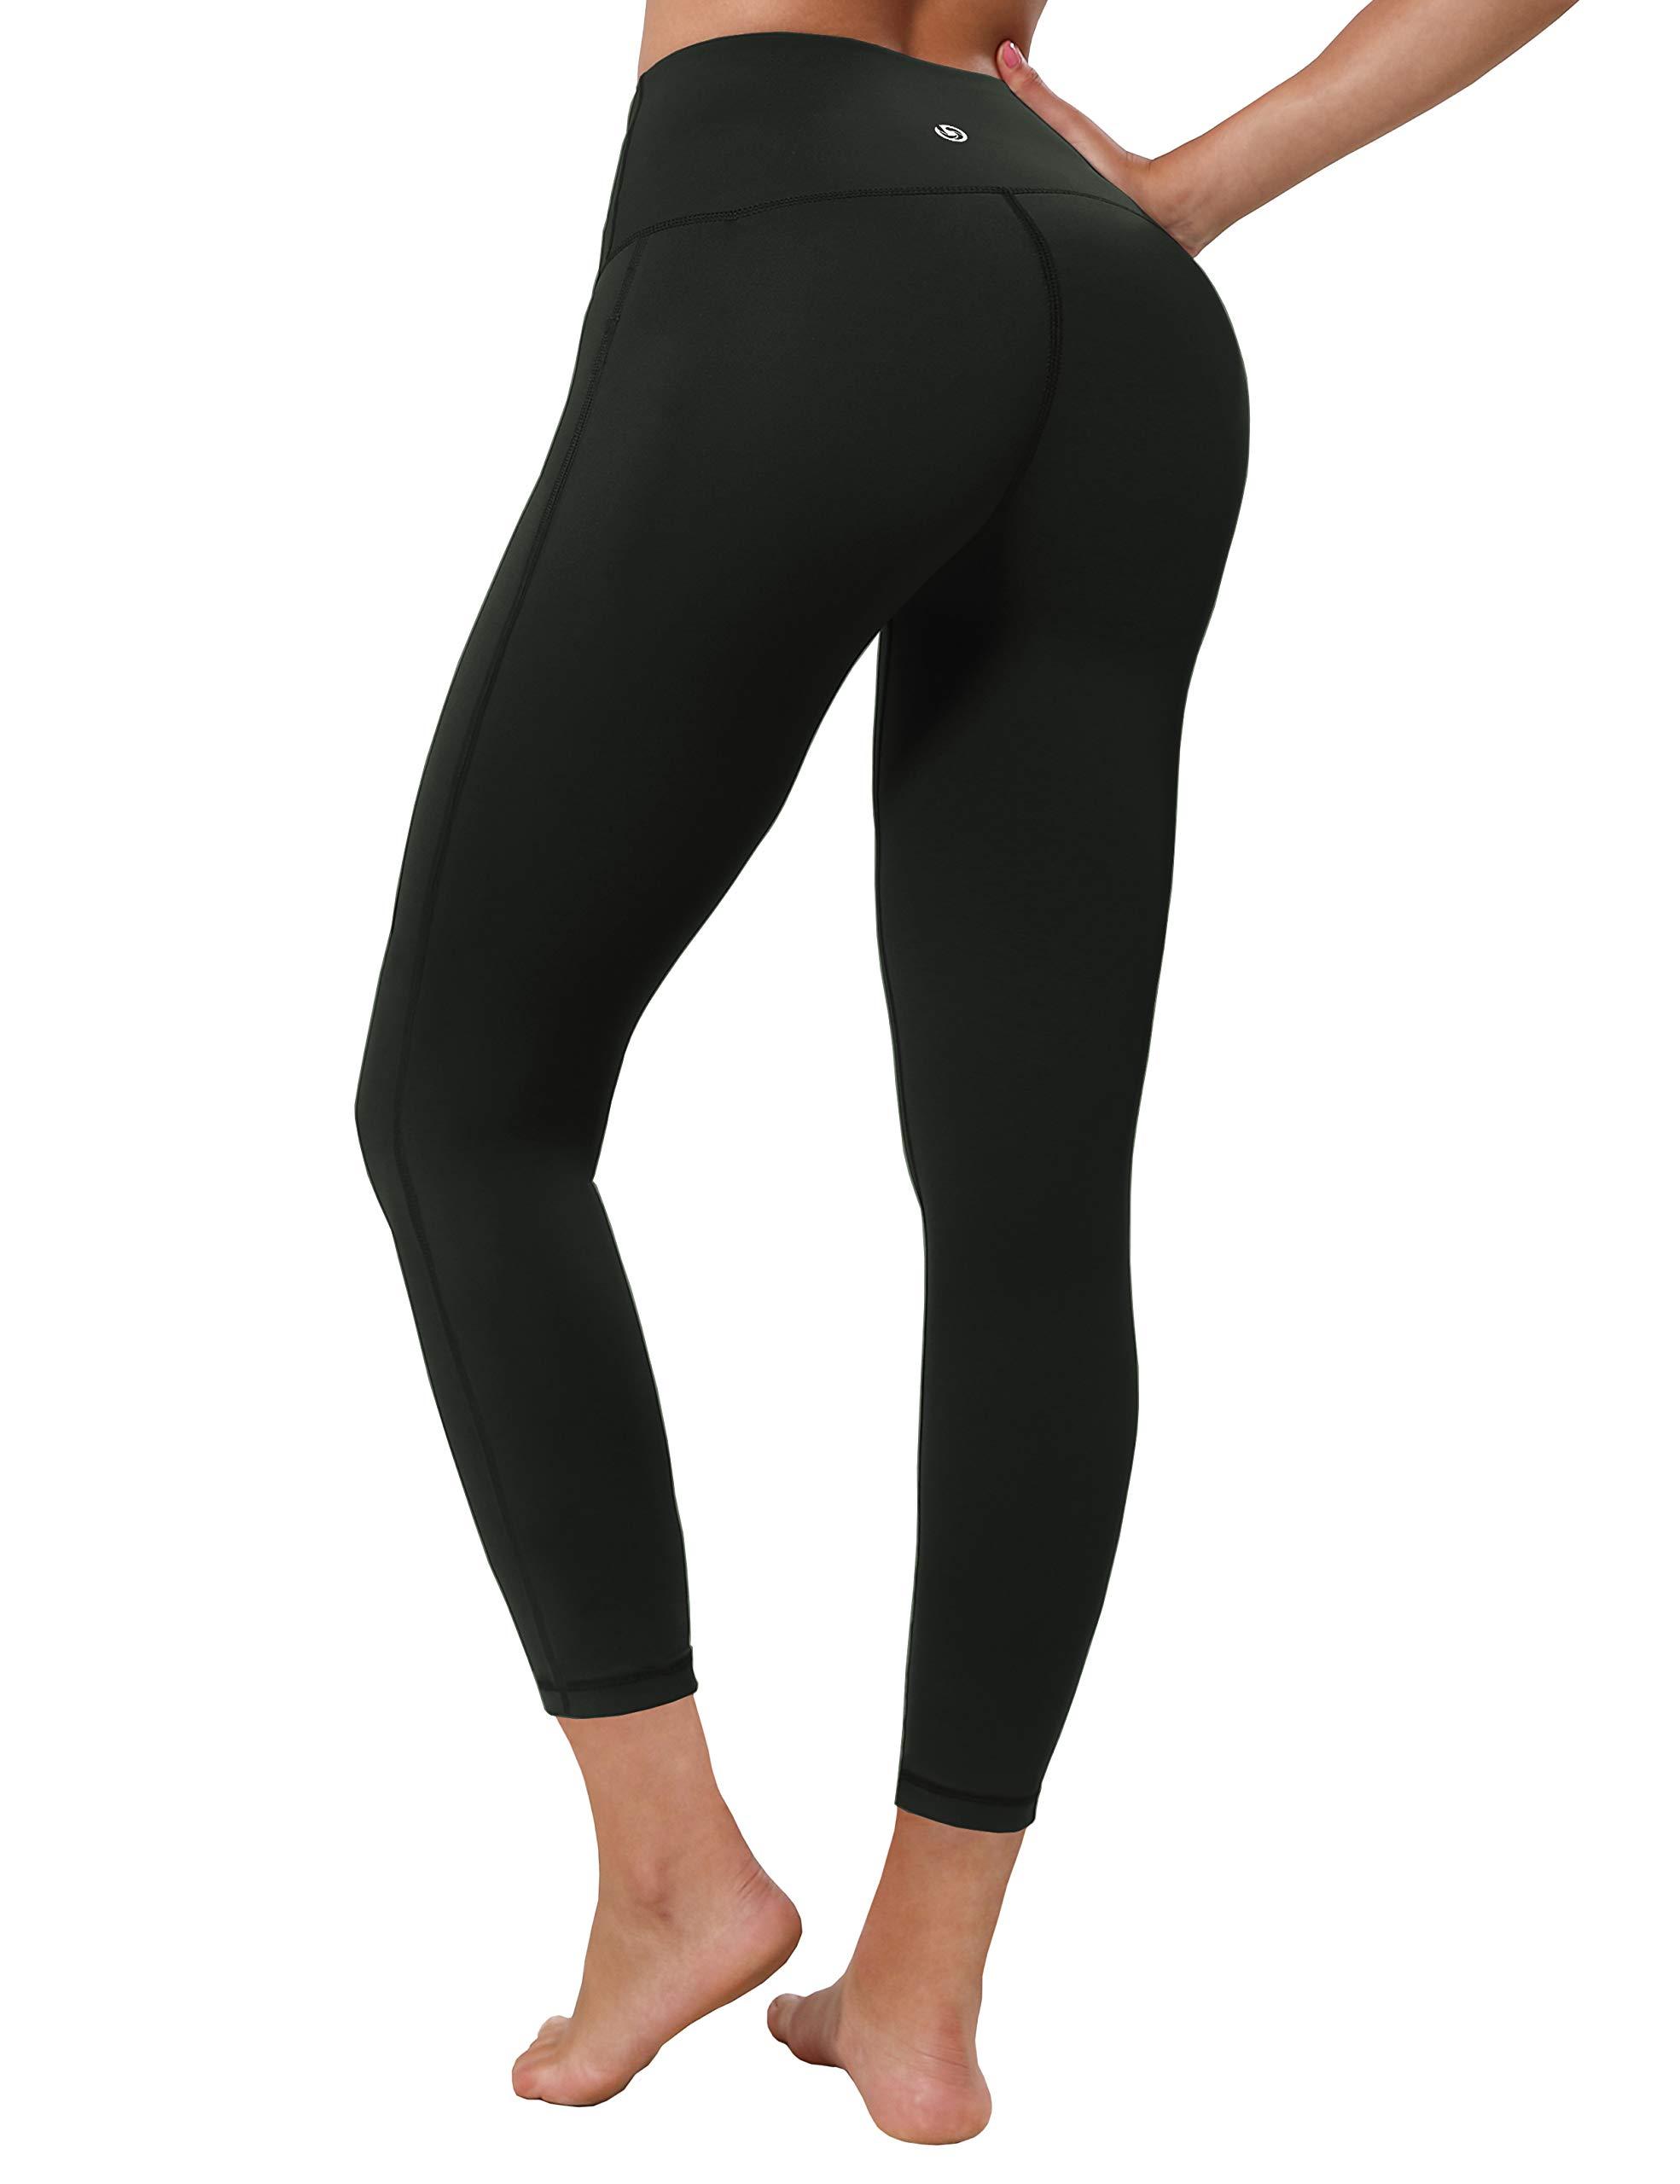 "BUBBLELIME 22""/26""/28"" Inseam Yoga Pants Inner Pocket Workout Running Leggings High Waist Single Line Long Pants"